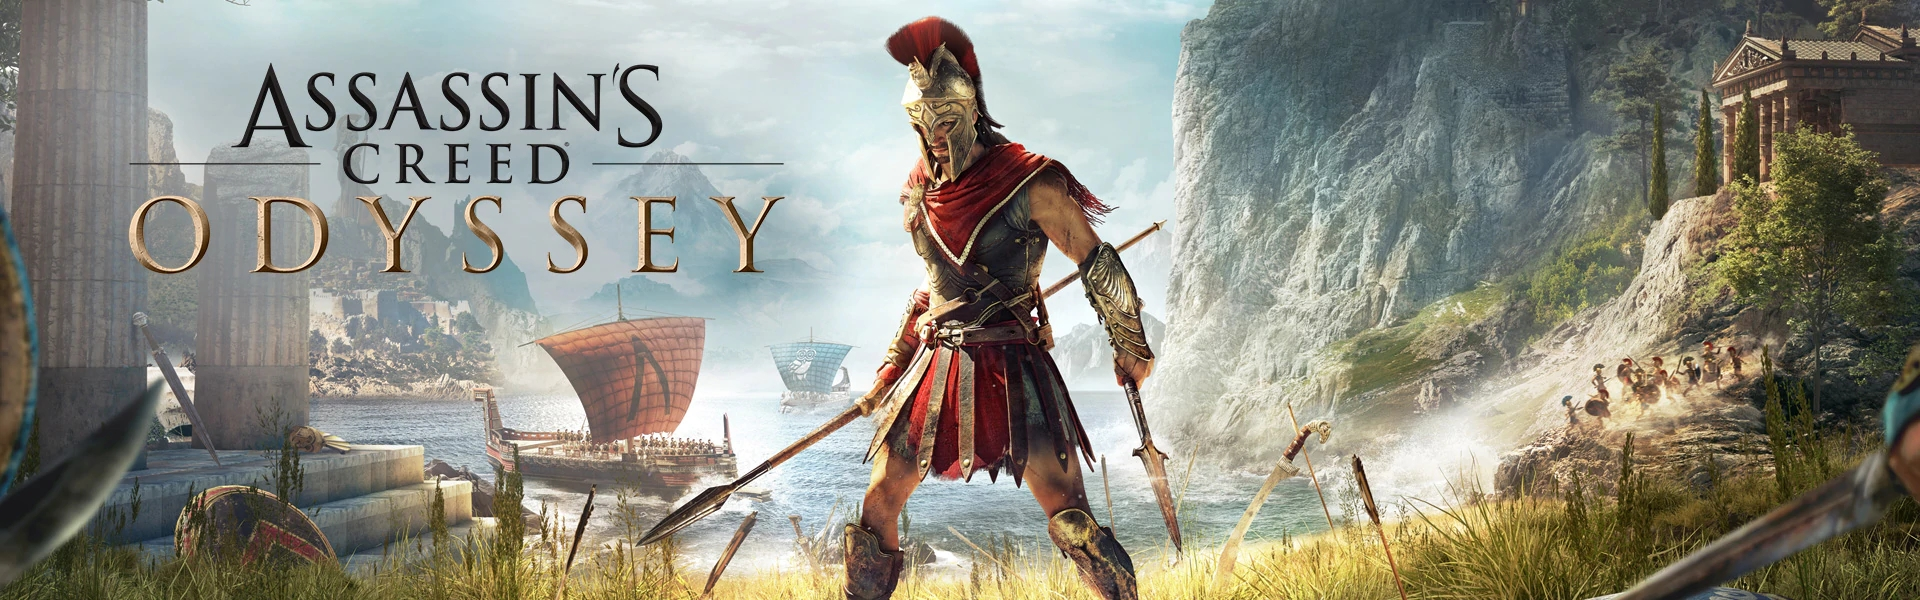 151549-Assassins-Creed-Odyssey-main-1920x600.jpg